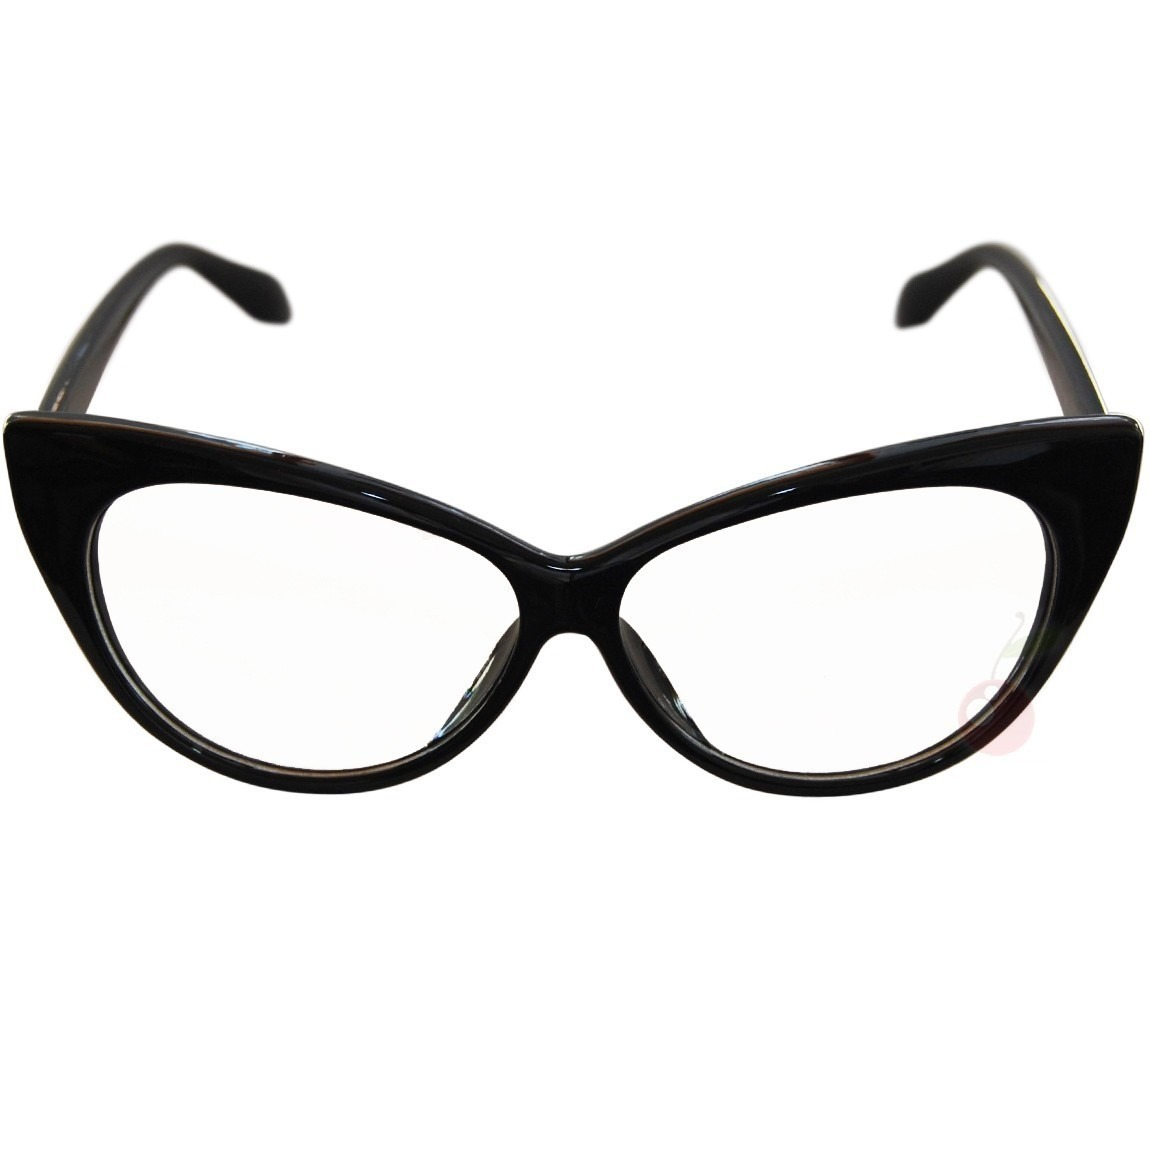 Transparent Cats Eye Glasses Frame